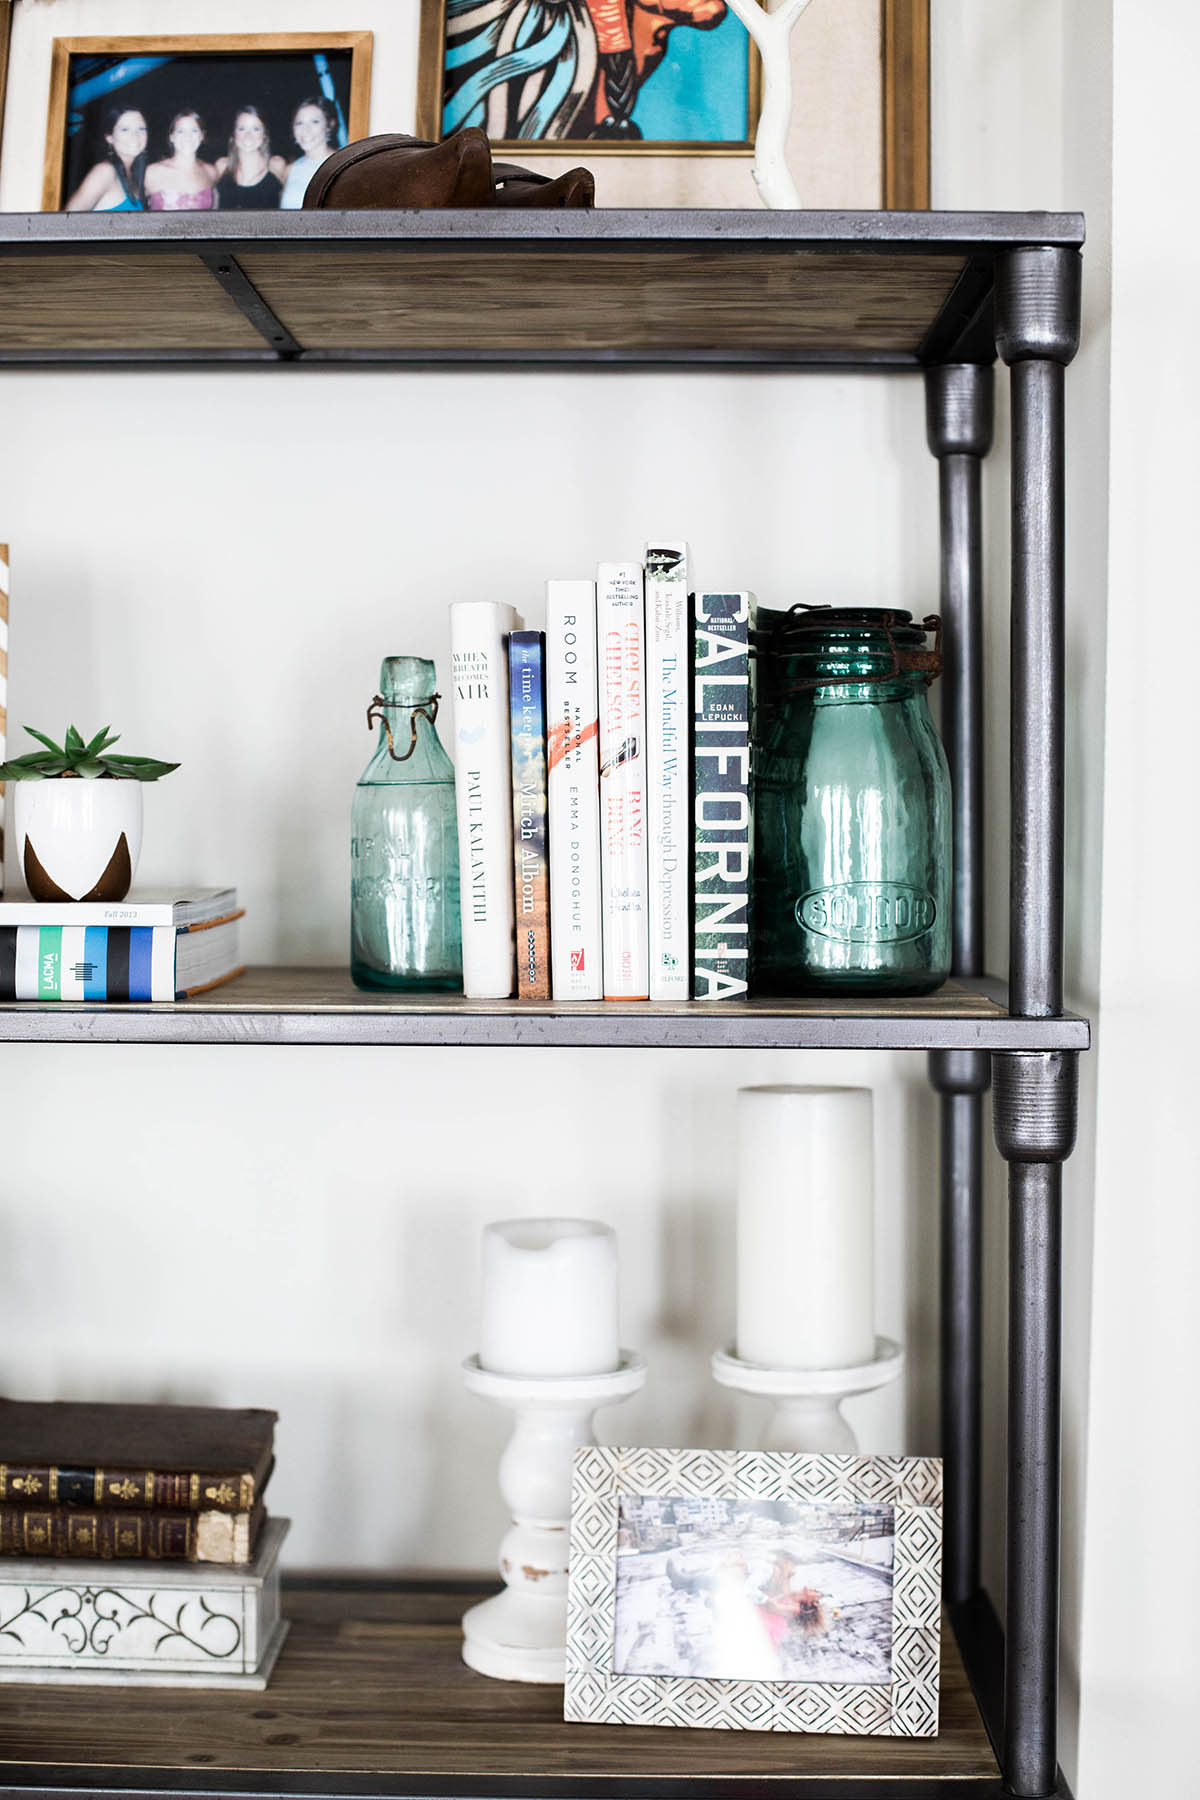 Bookshelf1 Bookshelf3 Bookshelf2